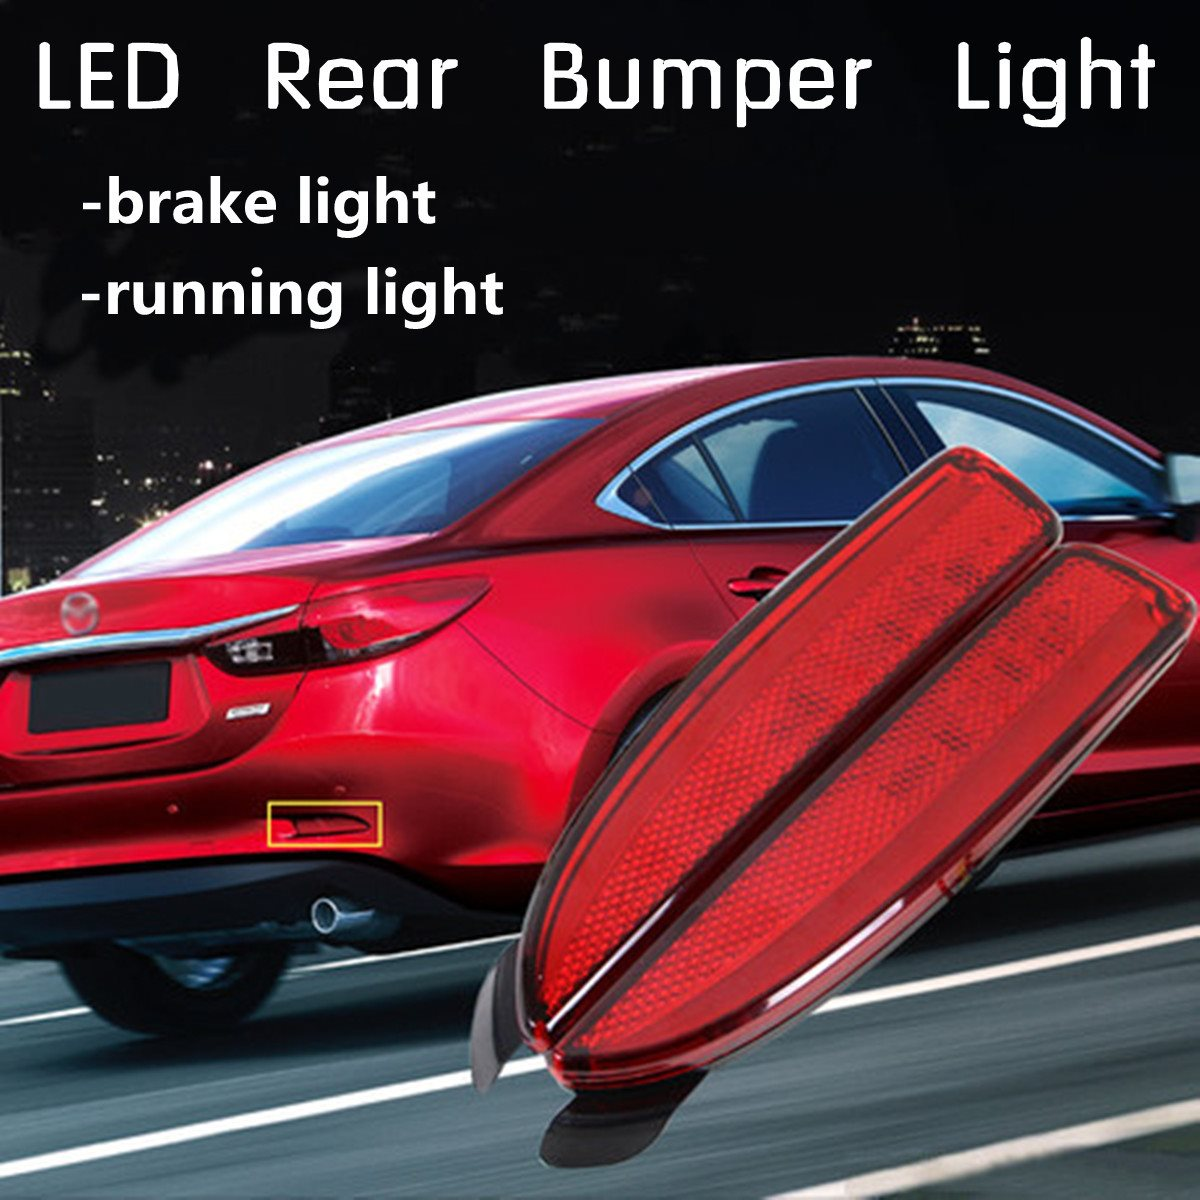 2Pcs LED Rear Bumper Reflector Tail Brake Stop Running Light For Mazda 6 ATENZA 2014-2016 cyan soil bay car styling 2pcs led rear bumper reflector brake stop light for mazda6 atenza mazda2 dy for mazda3 axela ca240